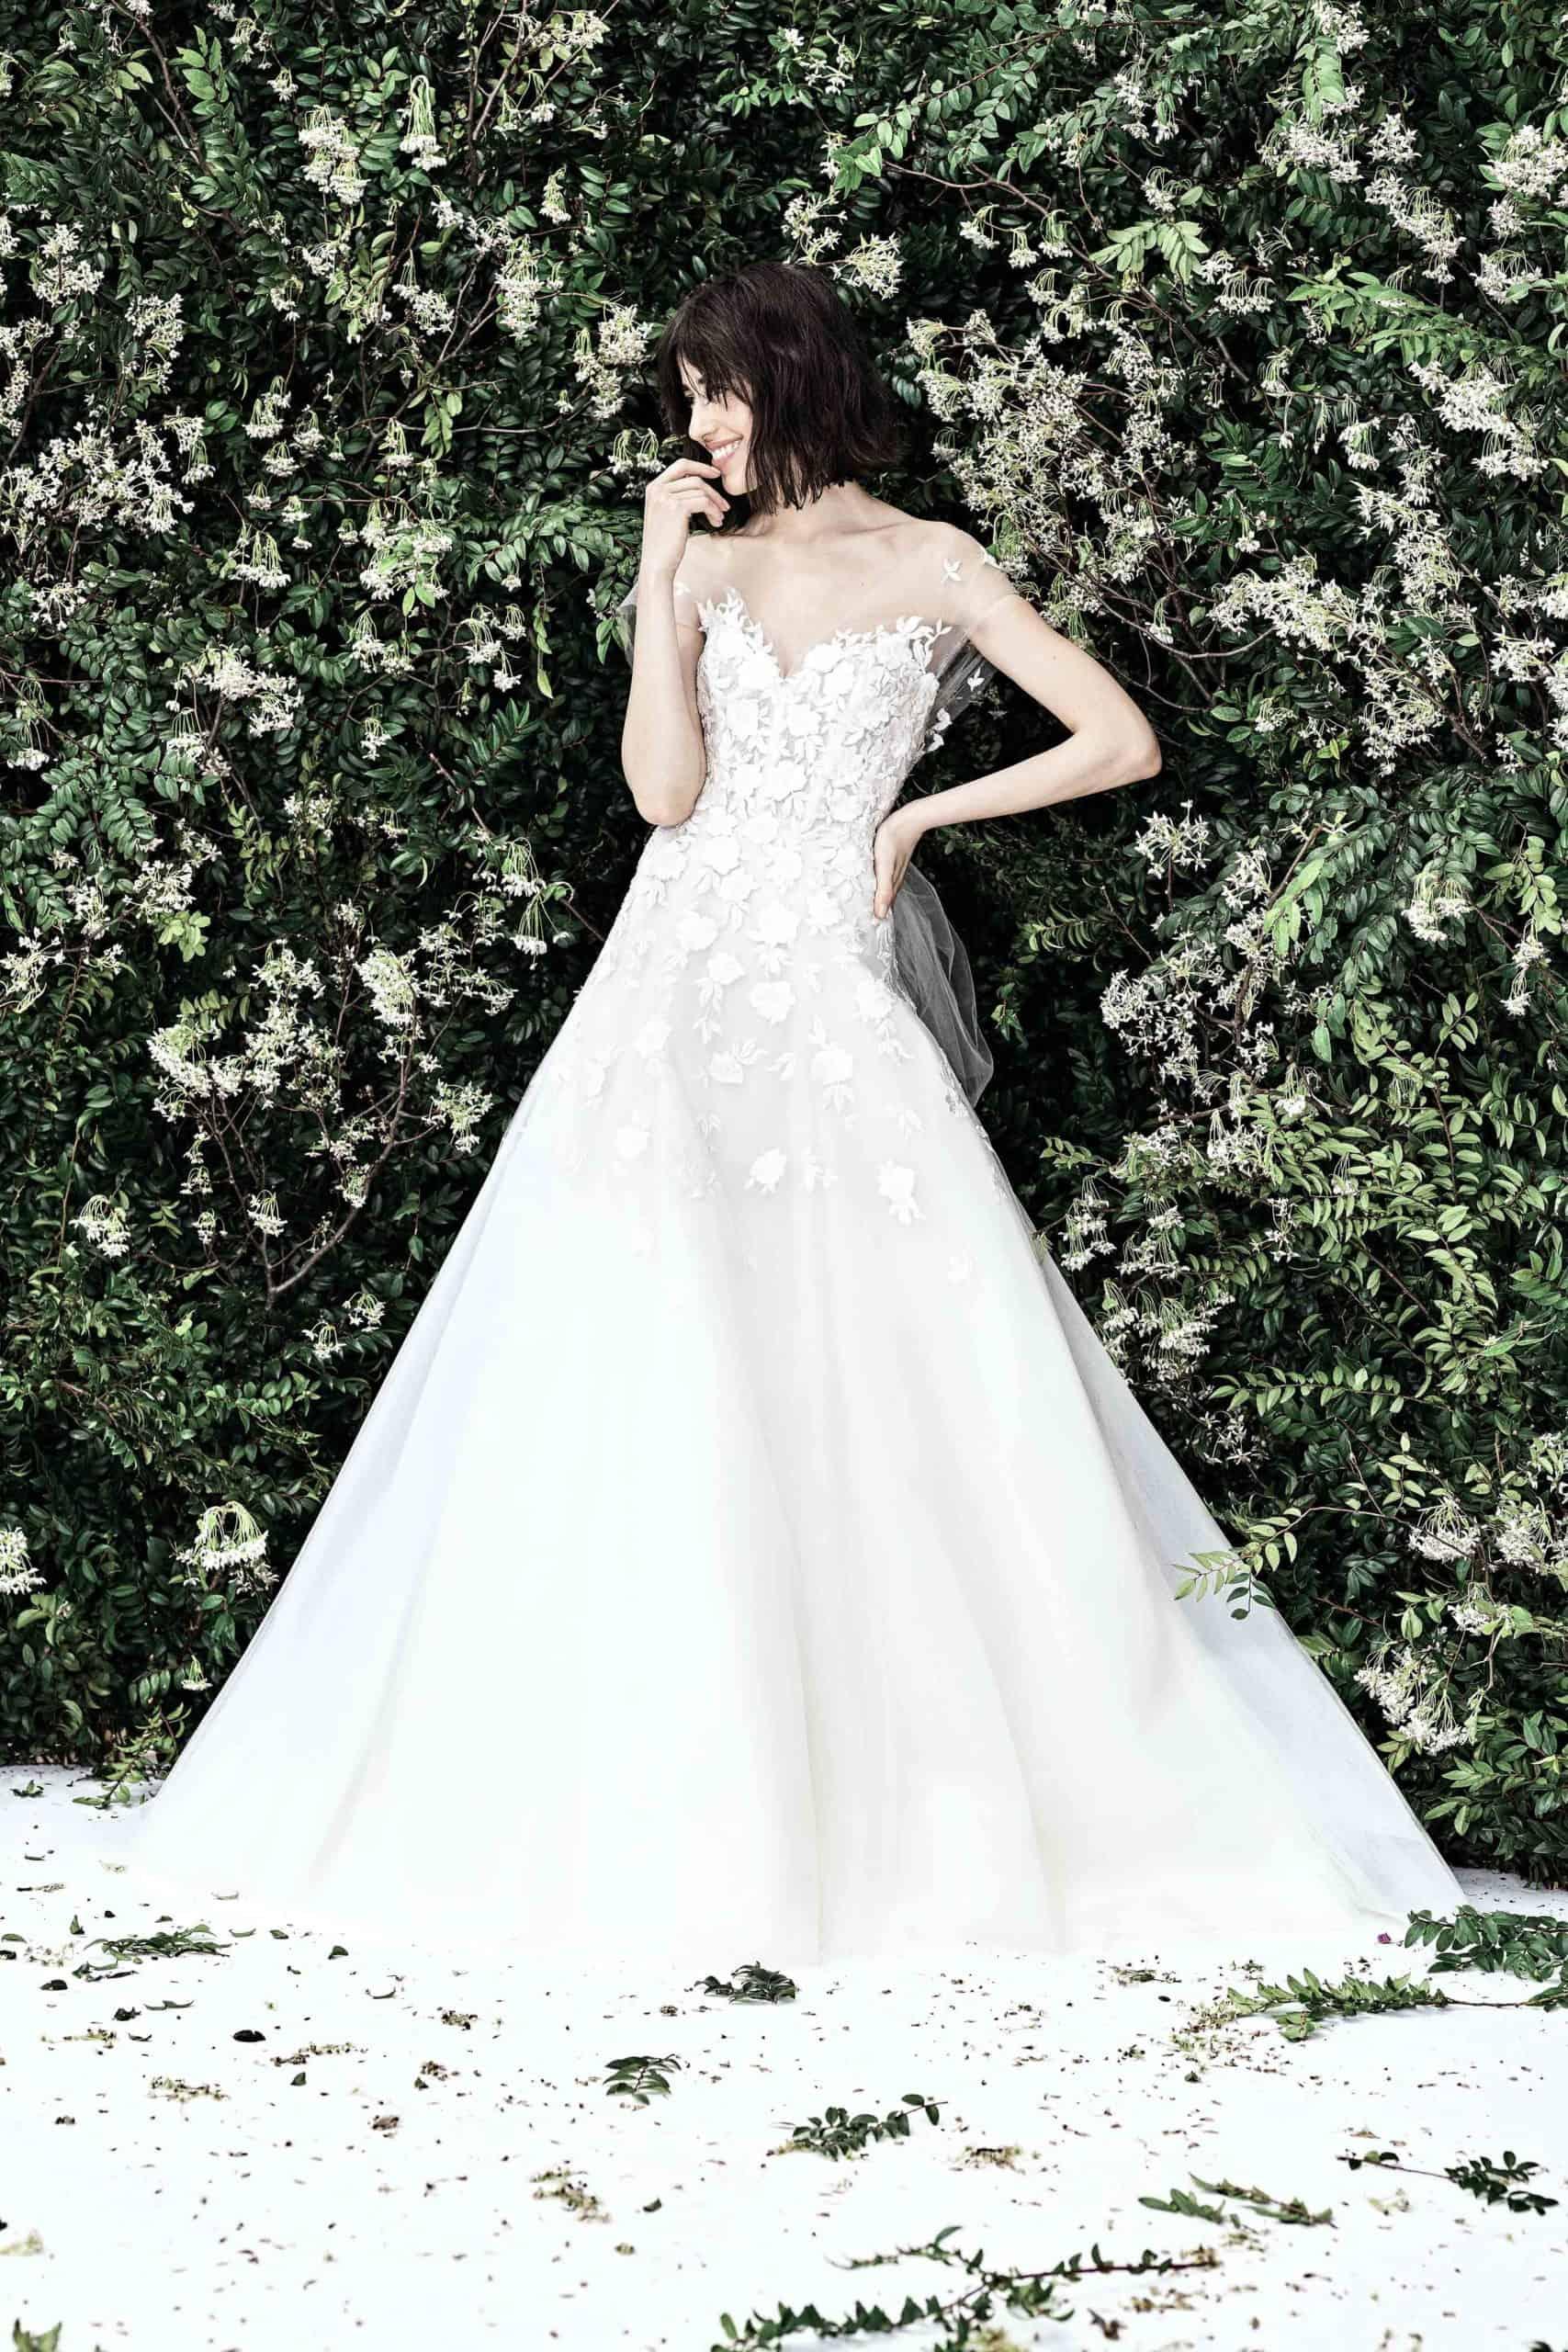 strapless a-line wedding dress with lace by Carolina Herrera